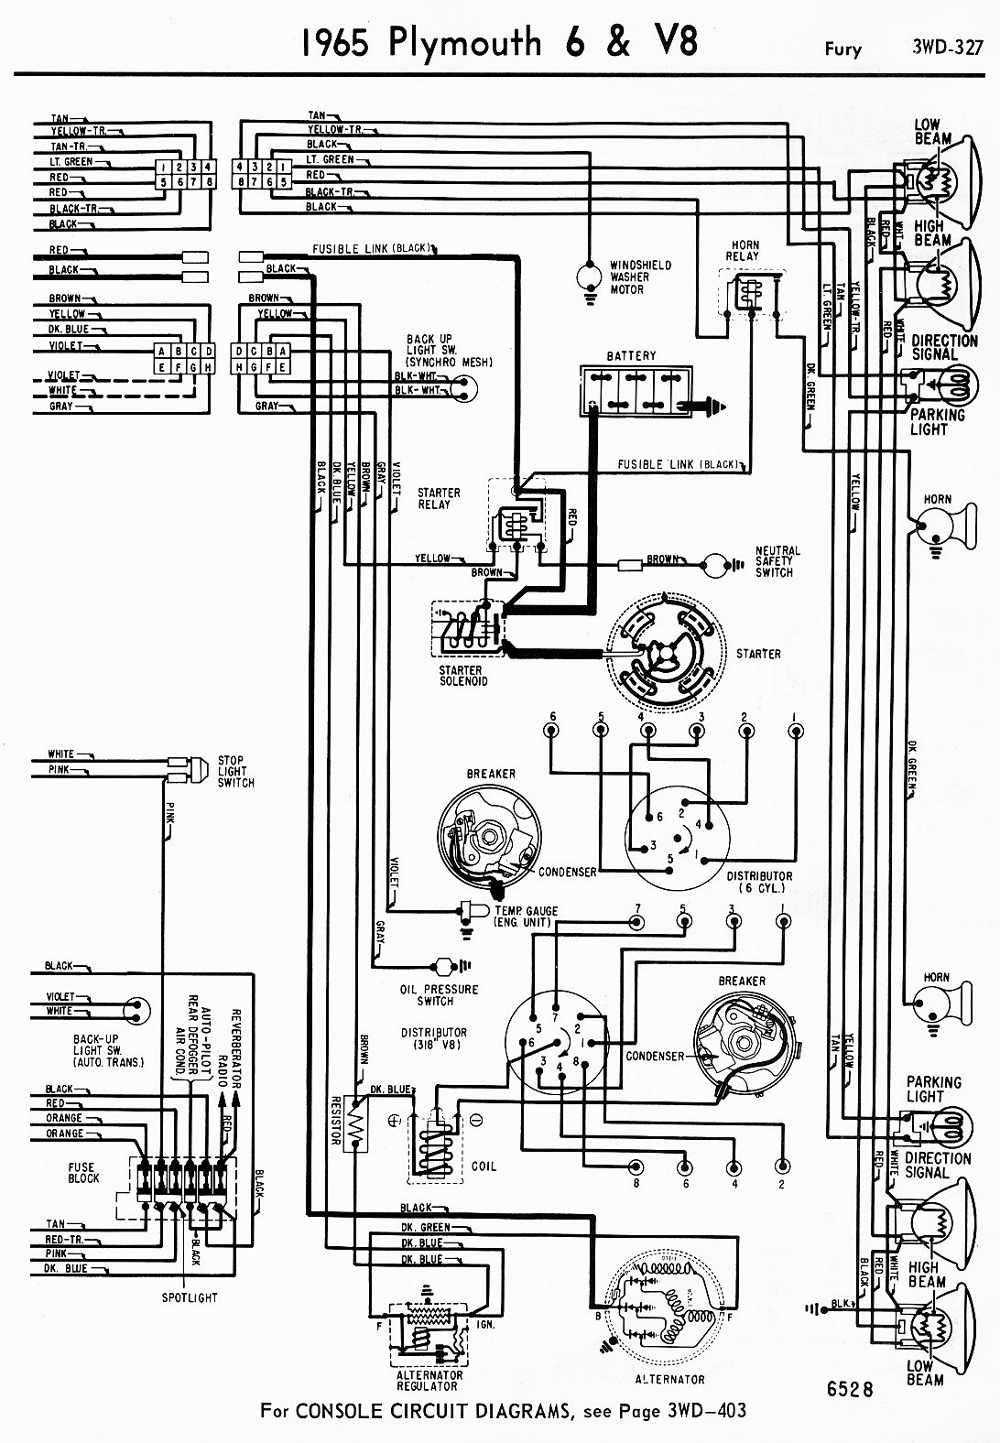 1970 plymouth duster wiring diagram wiring diagram third level74 plymouth duster wiring diagram wiring diagrams img [ 1000 x 1443 Pixel ]